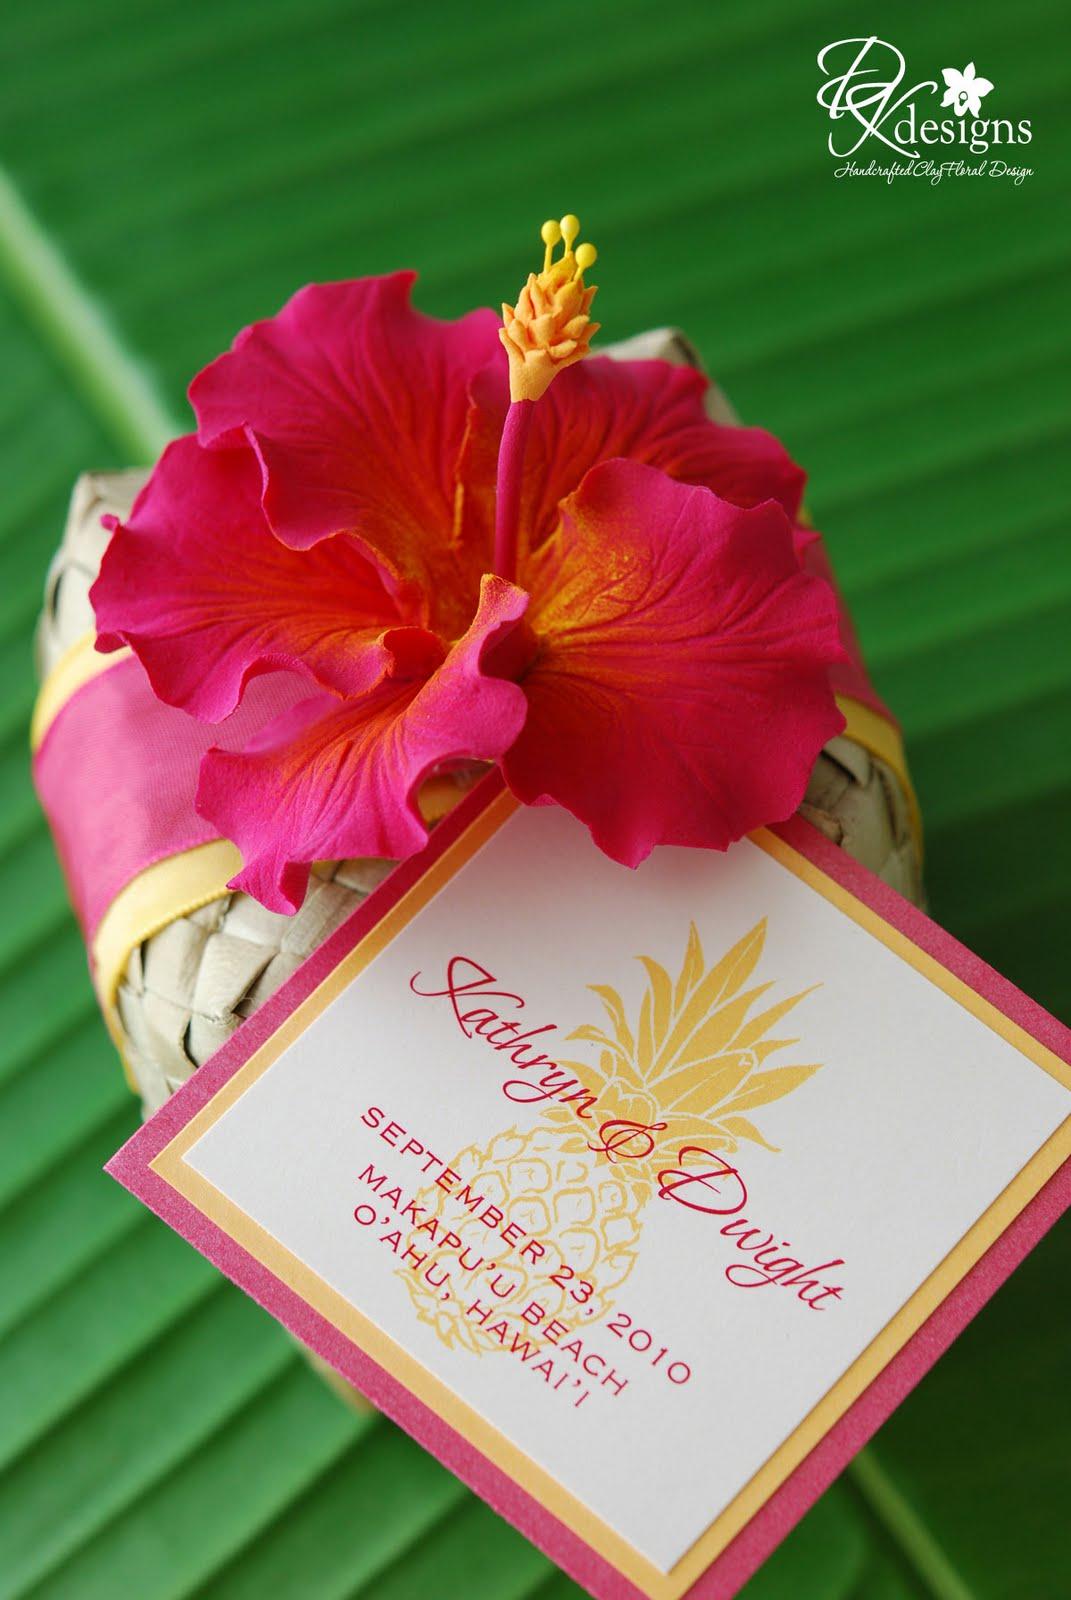 DK Designs: Tropical Wedding Favors